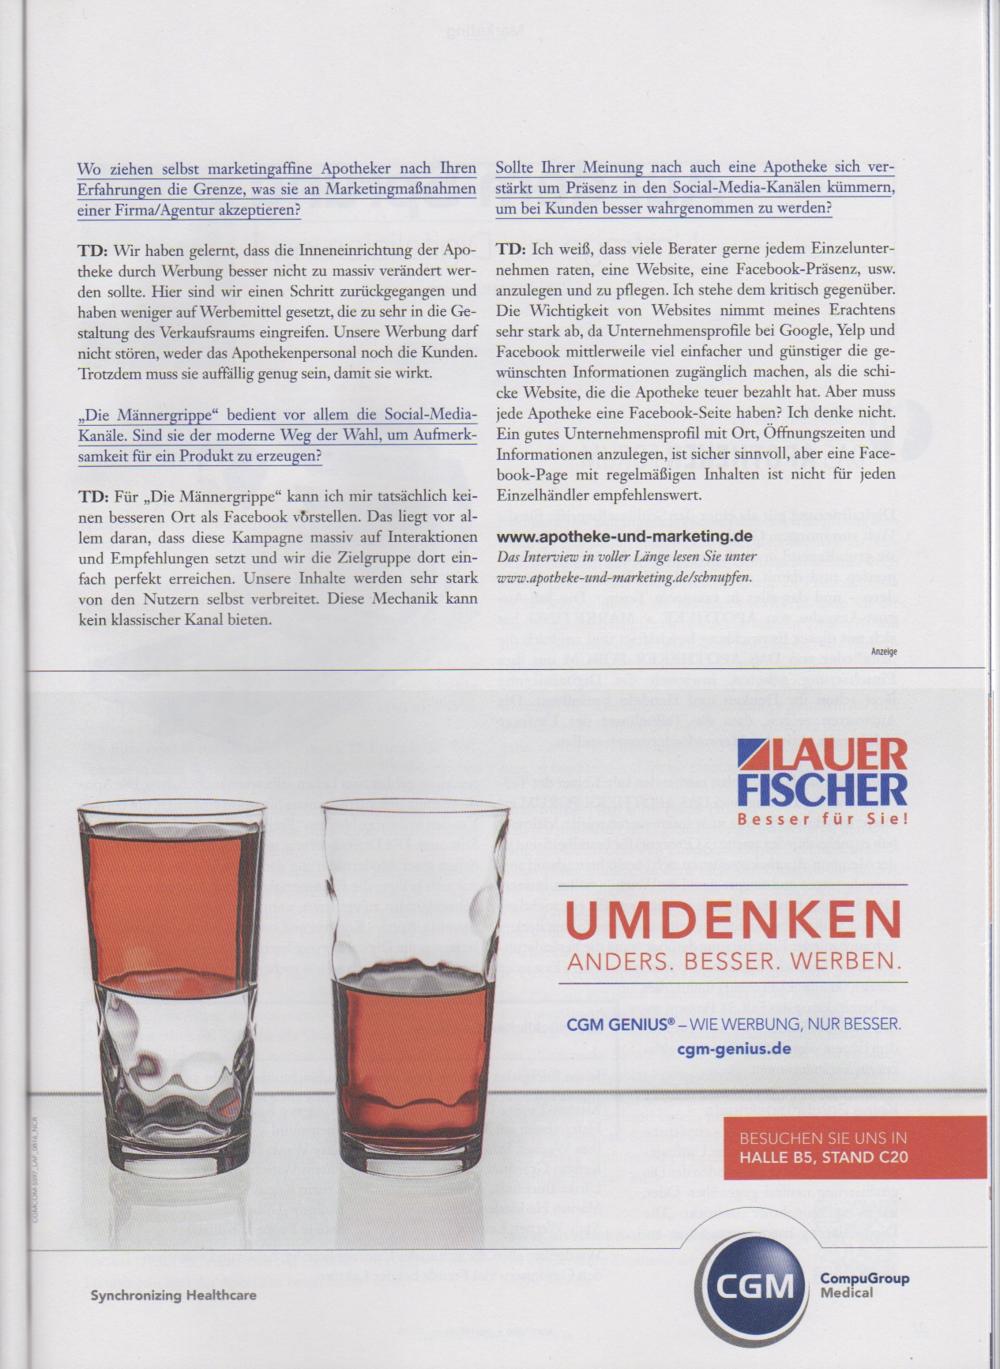 Apotheke_und_Marketing_3.png